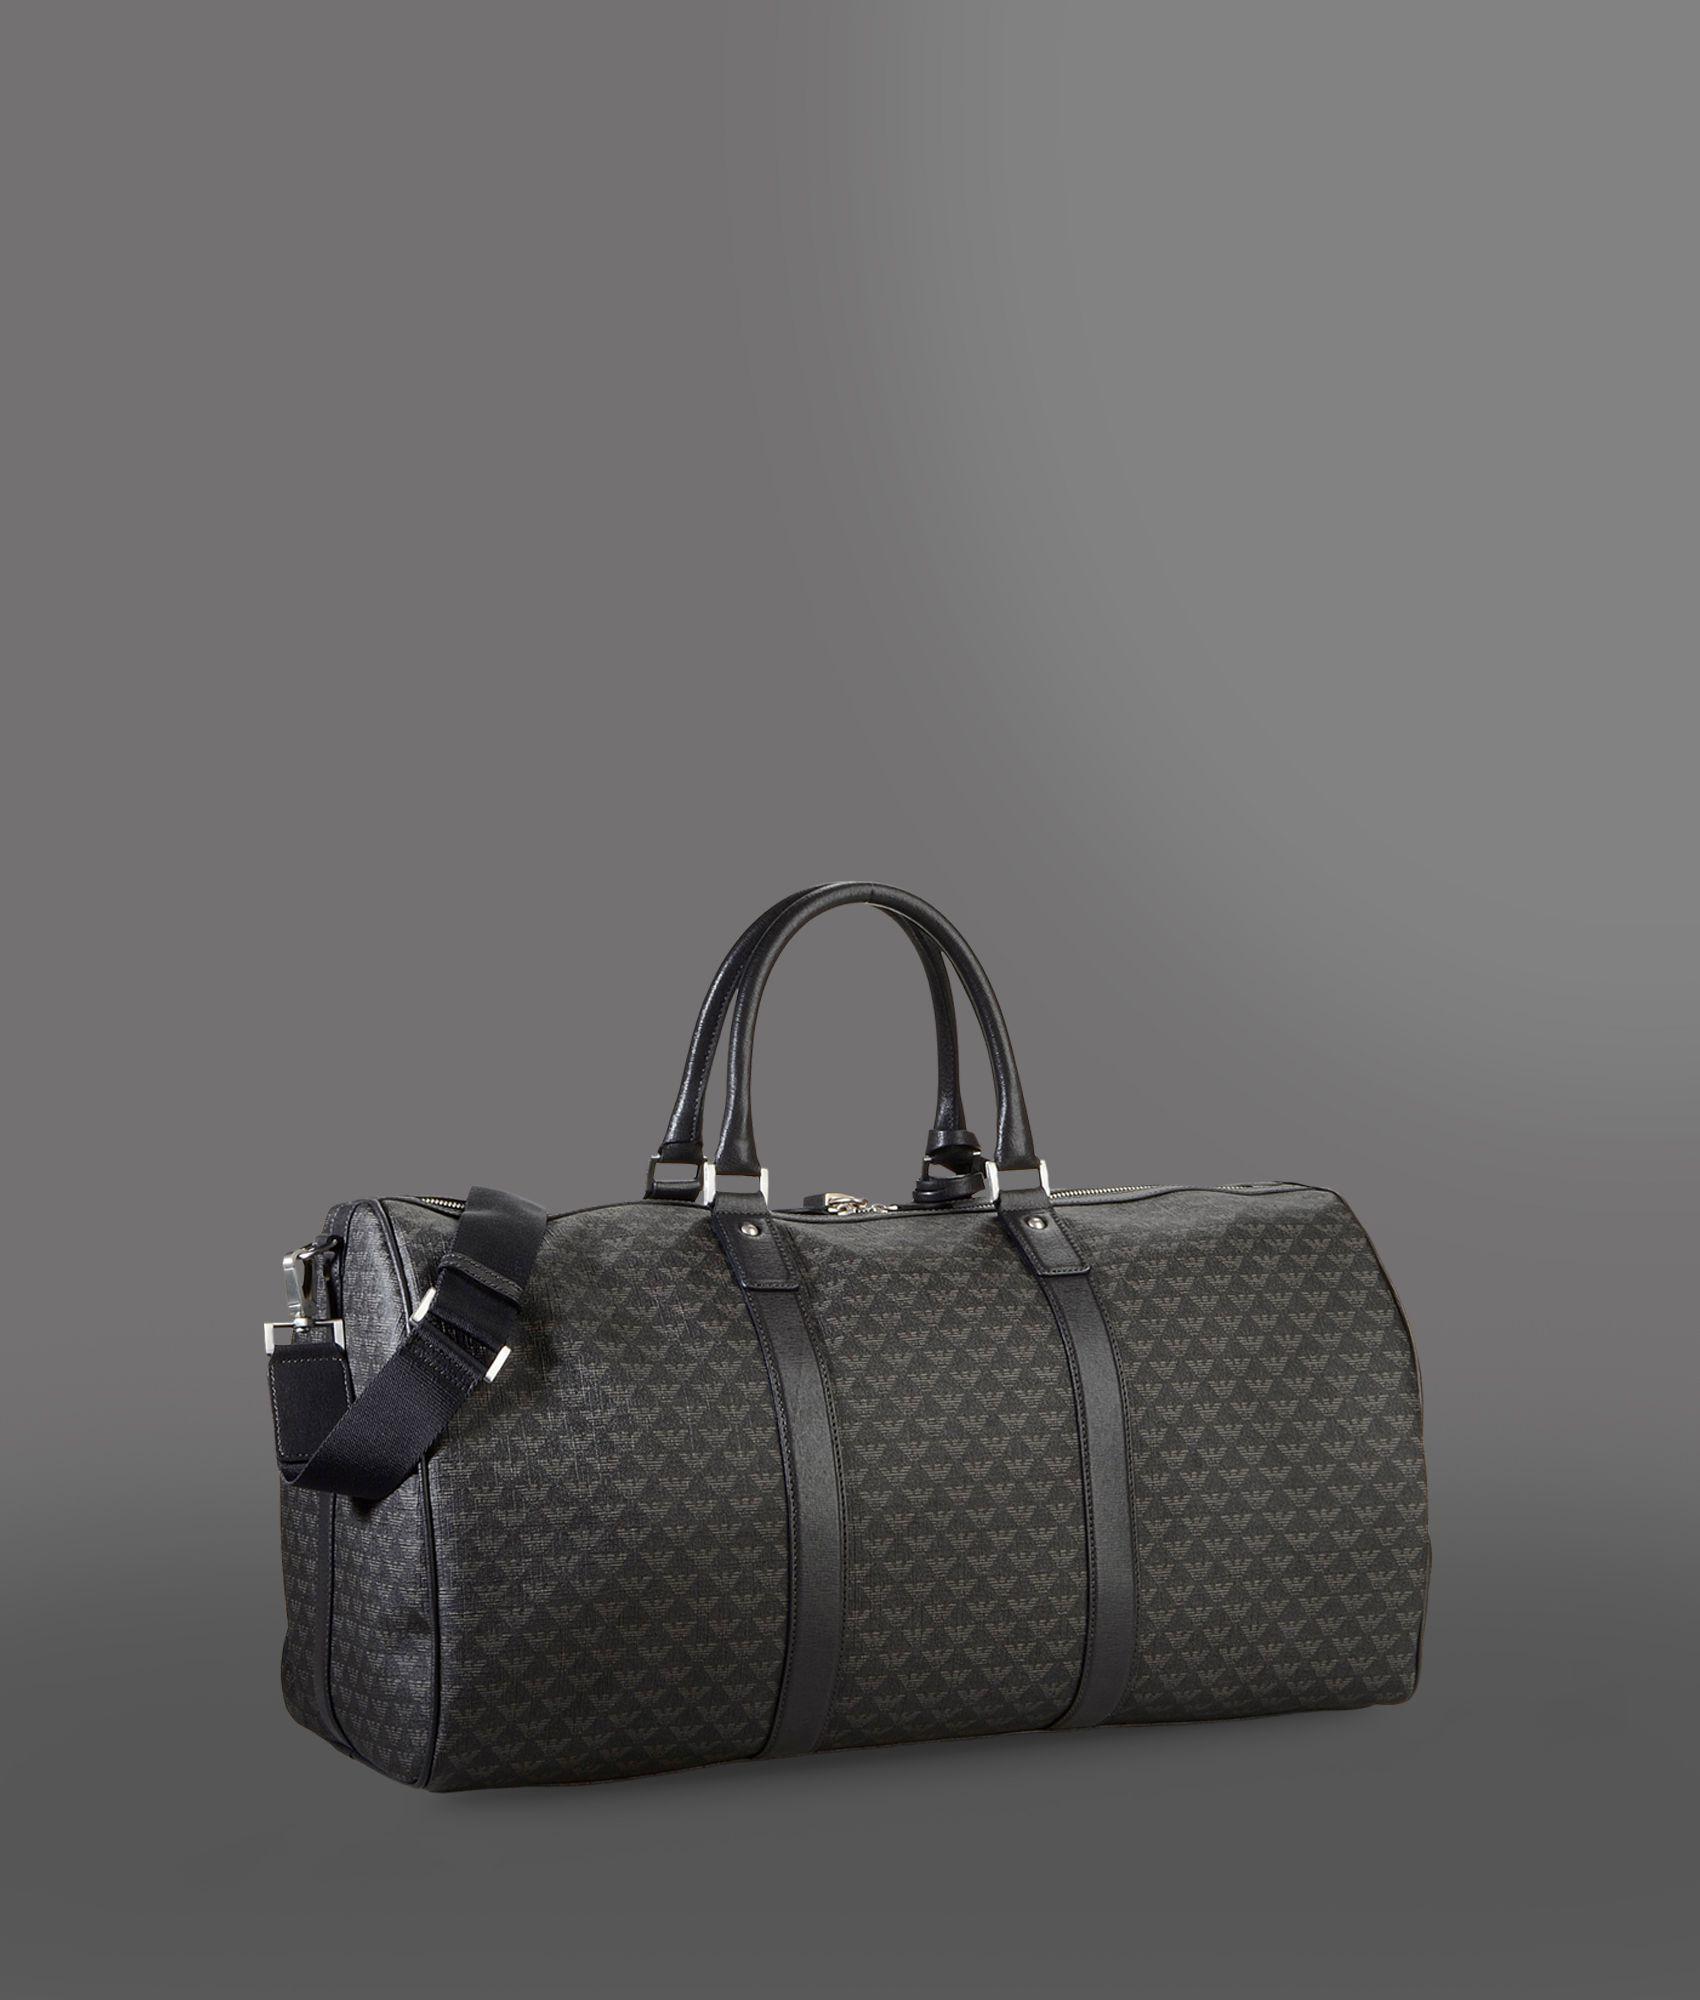 Lyst - Emporio Armani Weekender Bag in Gray for Men 47bada5667cf4